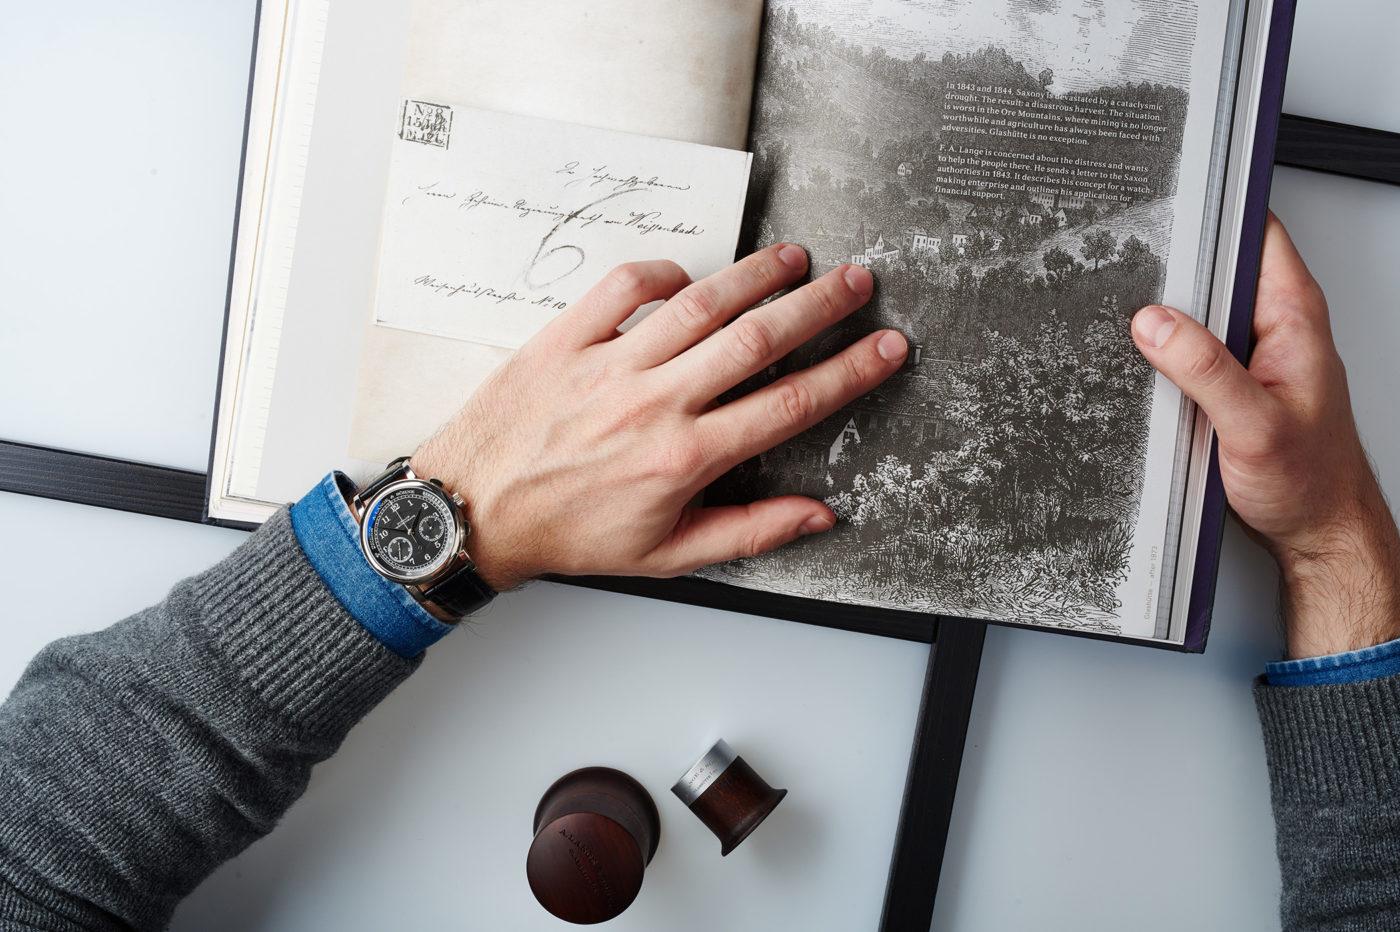 Zegarek - jak trafił na nadgarstek?